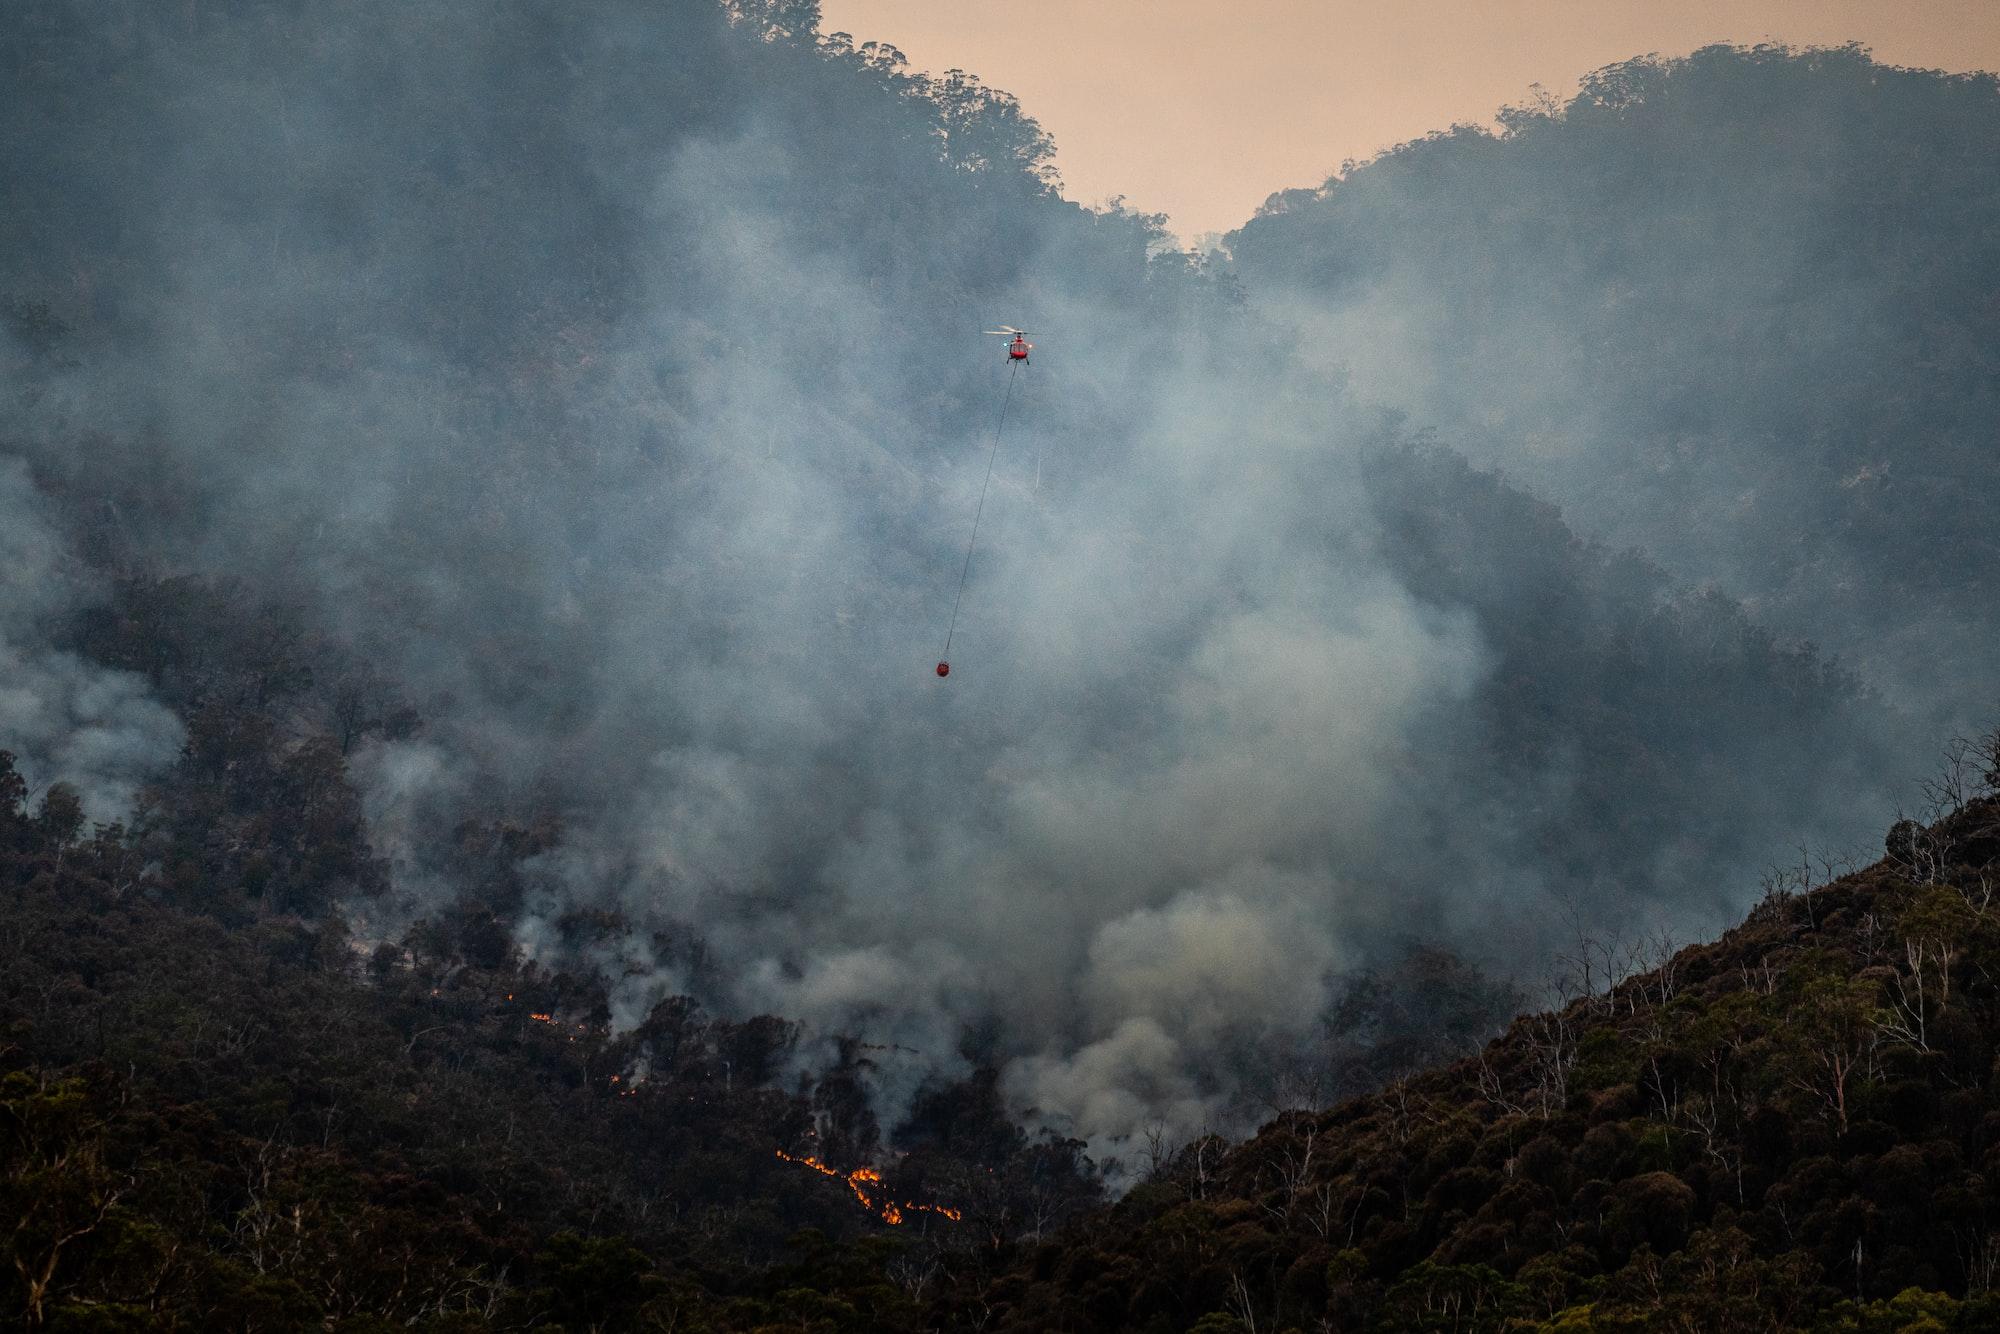 Firefighting at Fingal, Tasmania in 2020.